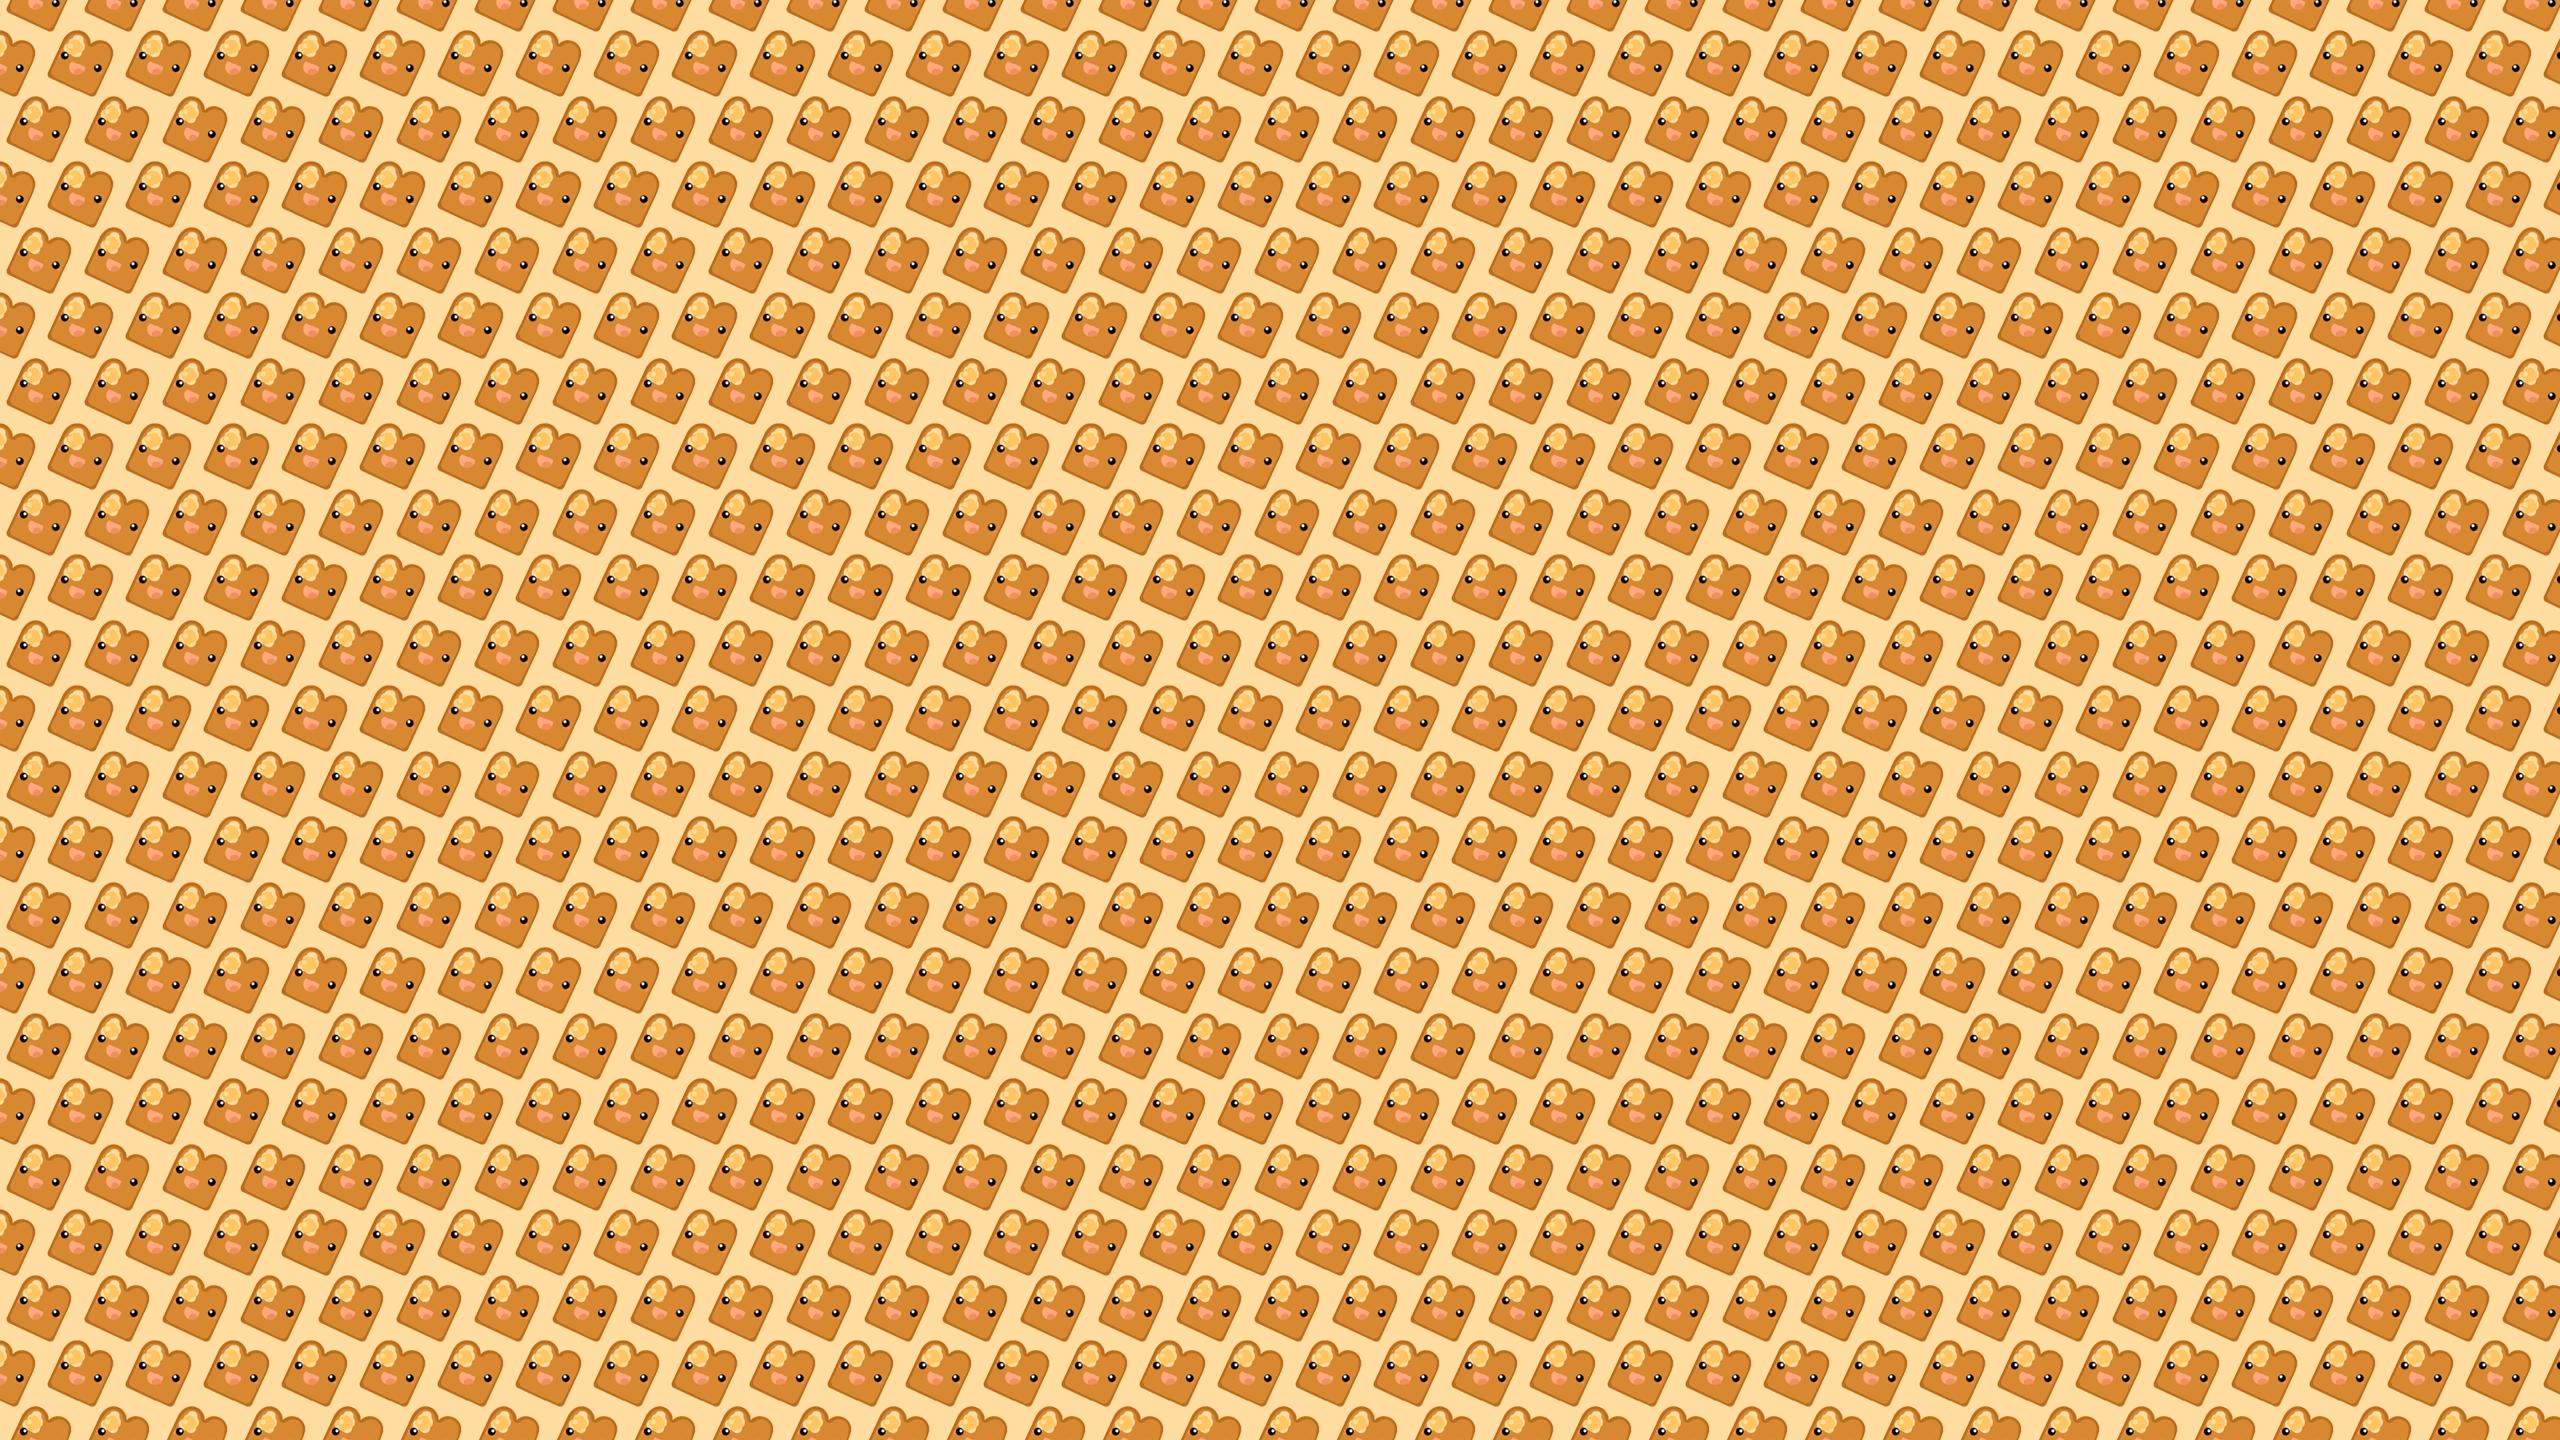 Best 51 Toast Wallpaper on HipWallpaper Toast Wallpaper Toast 2560x1440